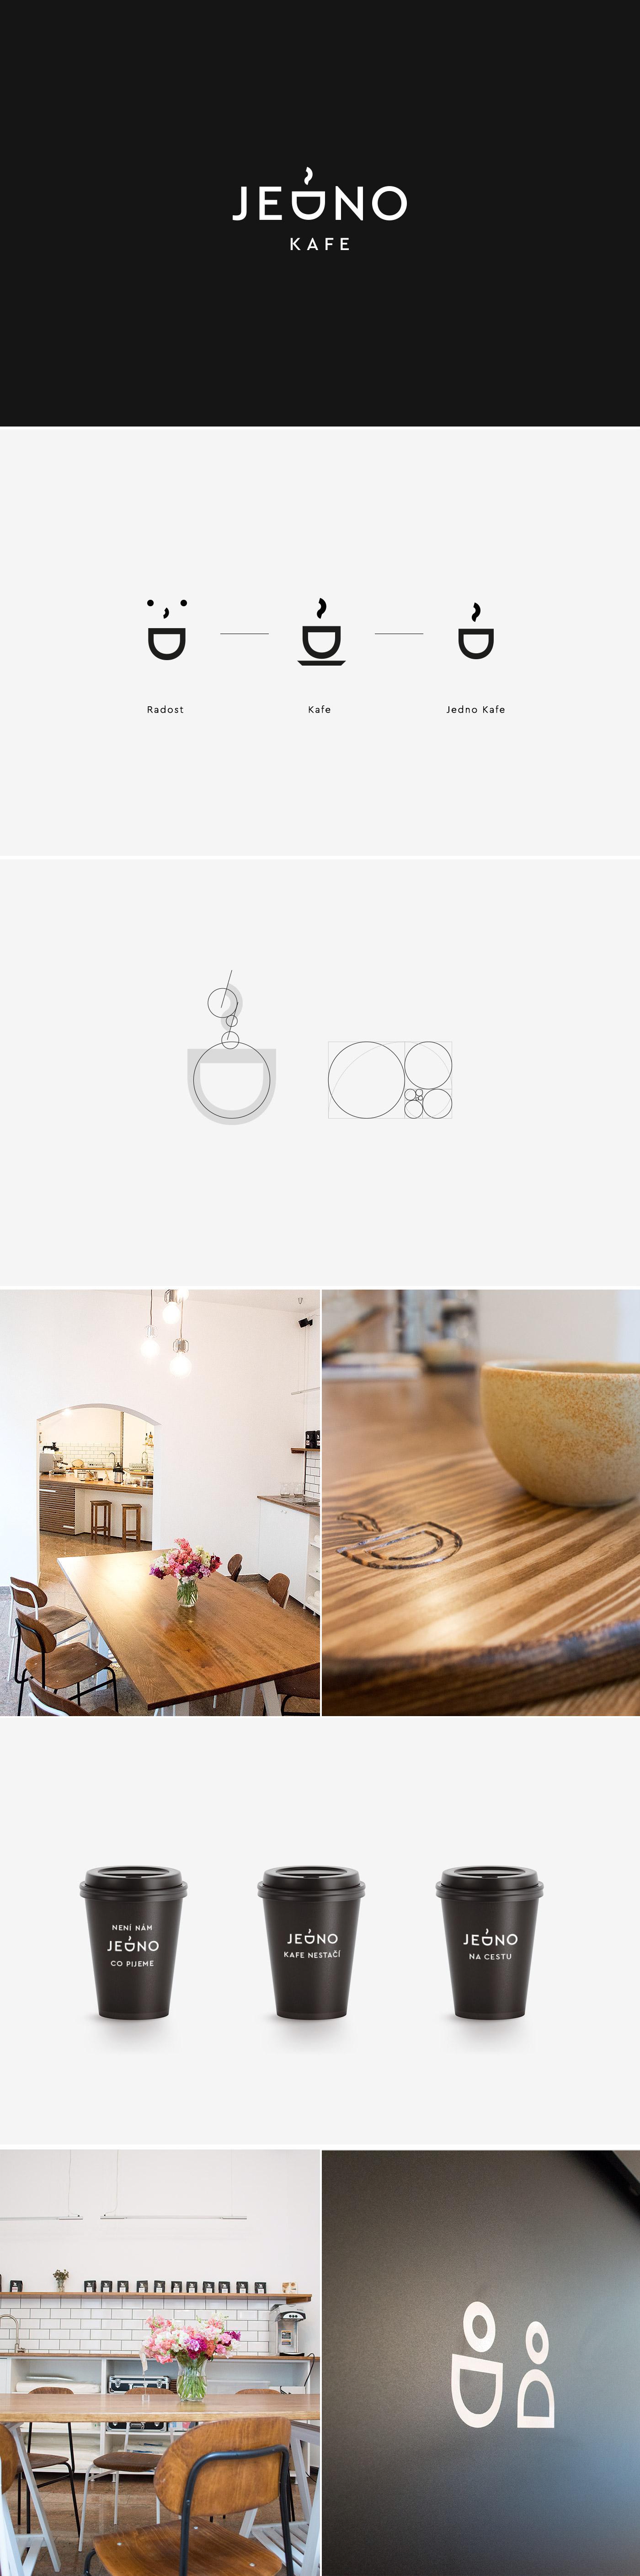 cafe Coffee branding  logo cup Corporate Identity CI